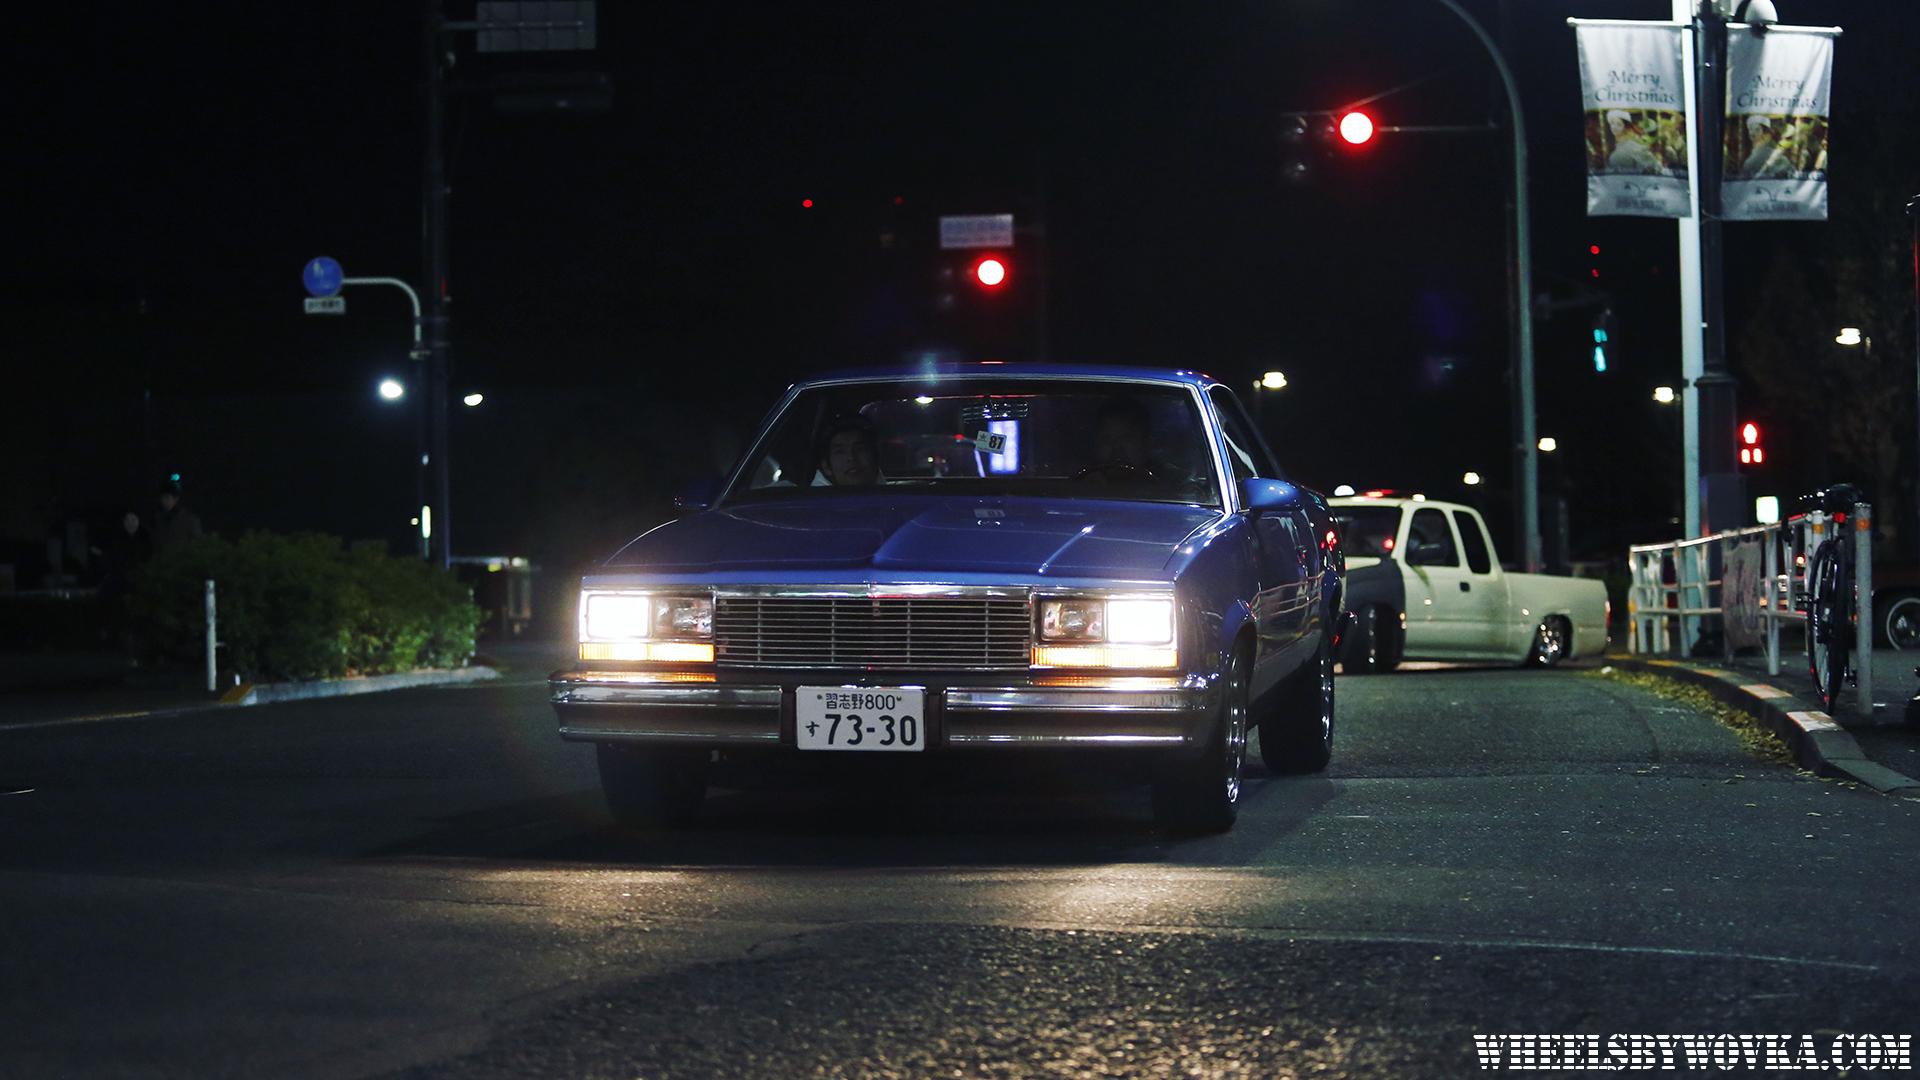 shibuya-japan-tokyo-lowrider-cruise-night-24